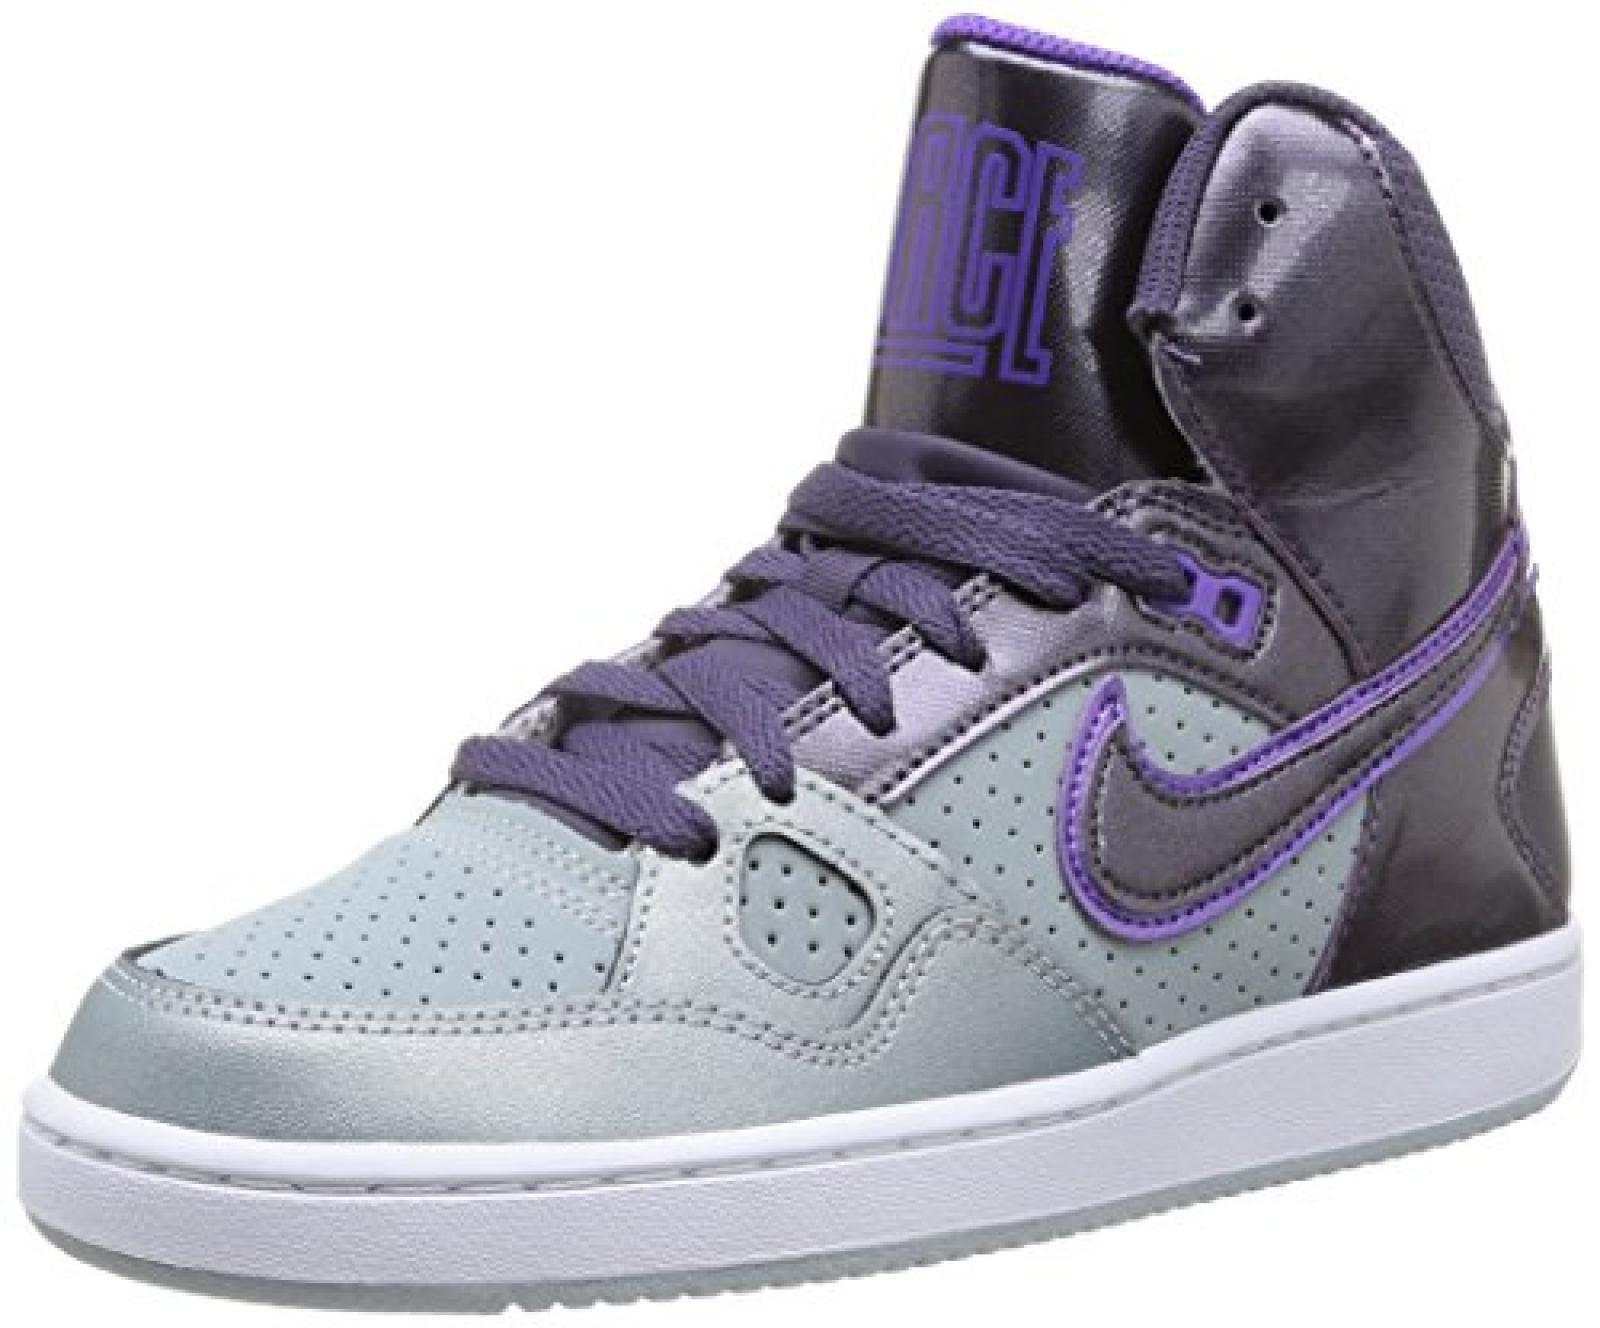 Nike 616303 009 Wmns Son Of Force Mid Damen Sportschuhe - Basketball